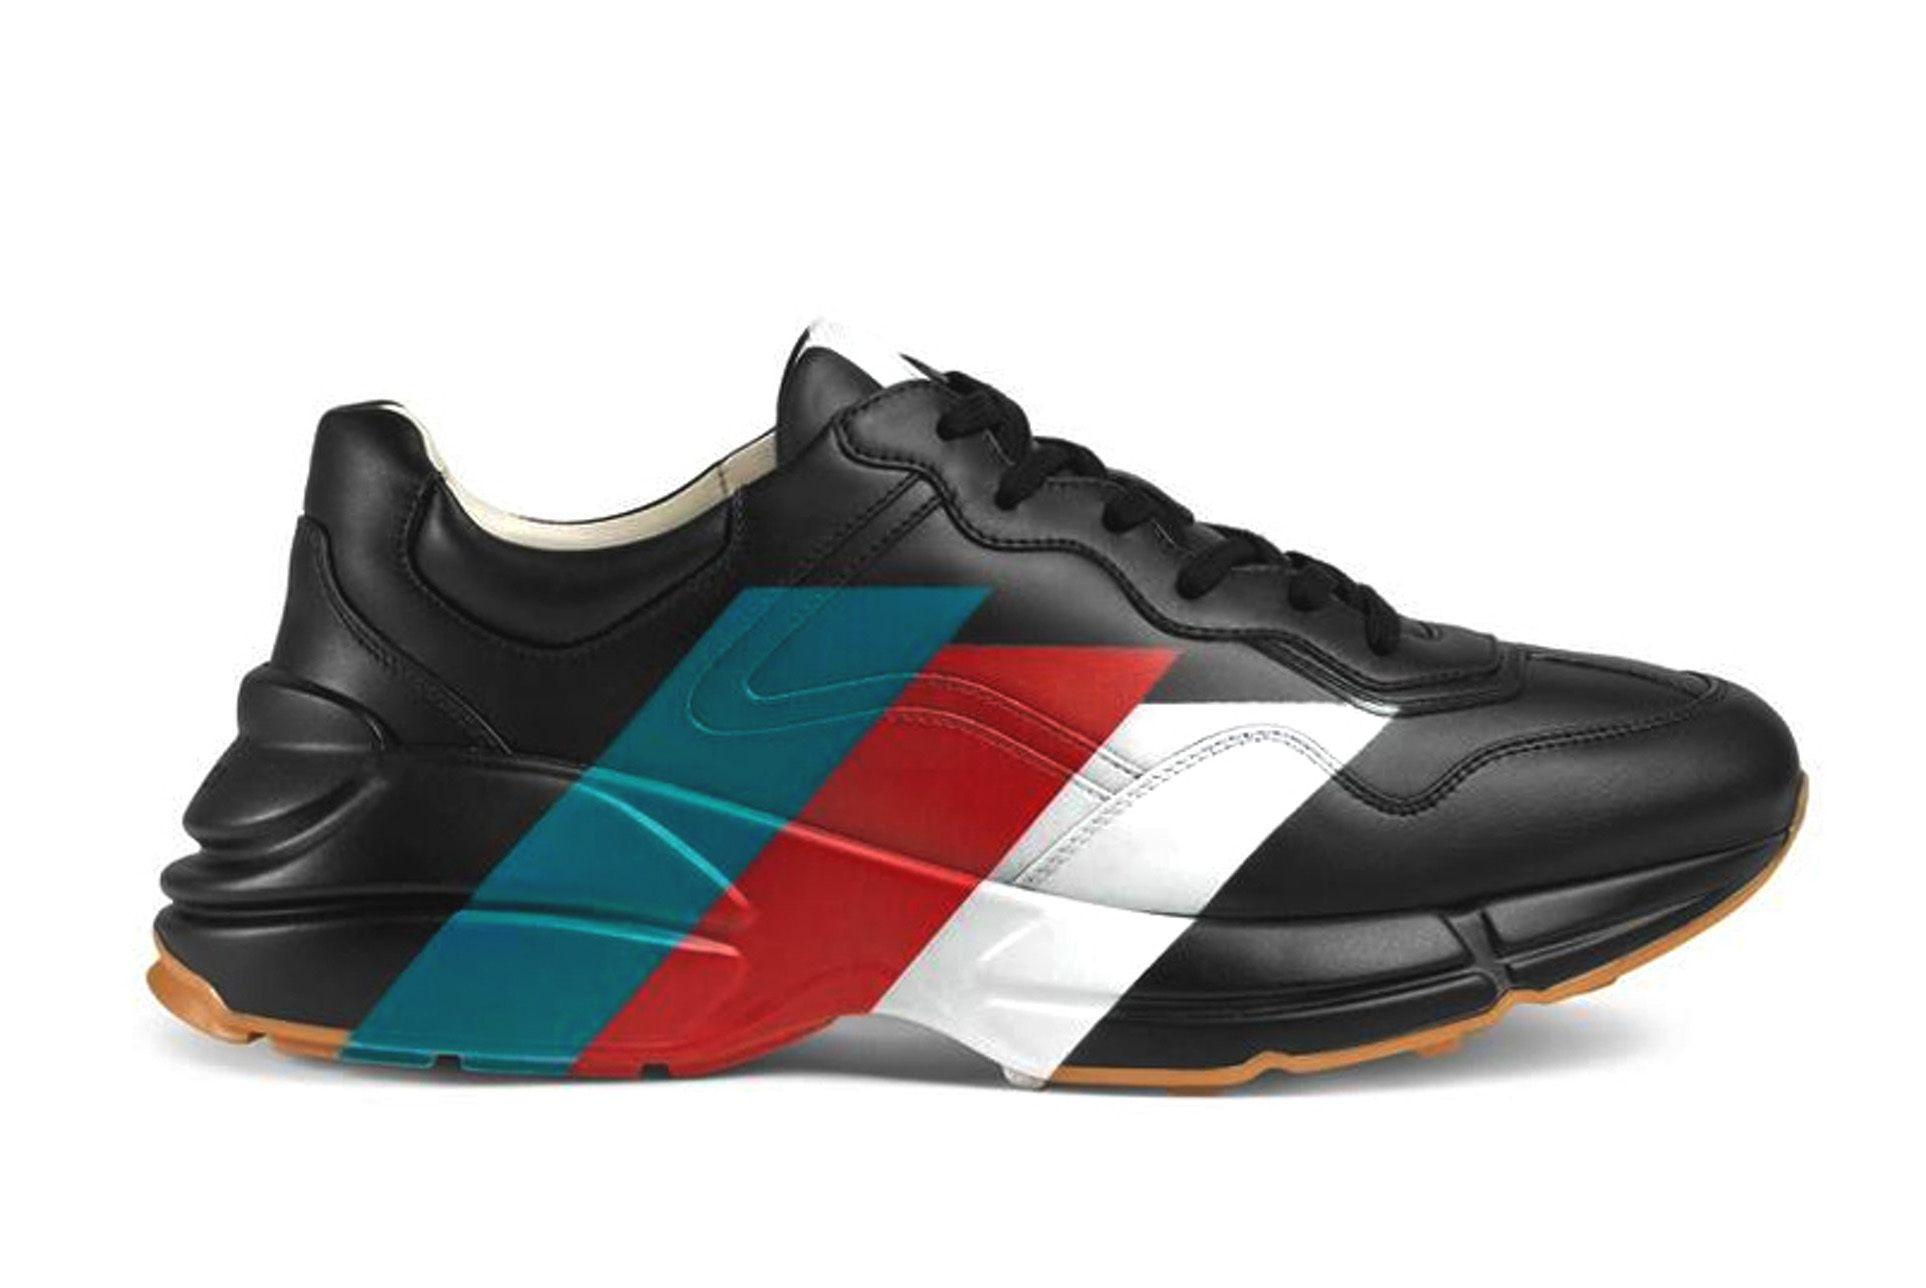 Gucci Rhyton Web Print Sneakers Black White Release 03 Sneaker Freaker